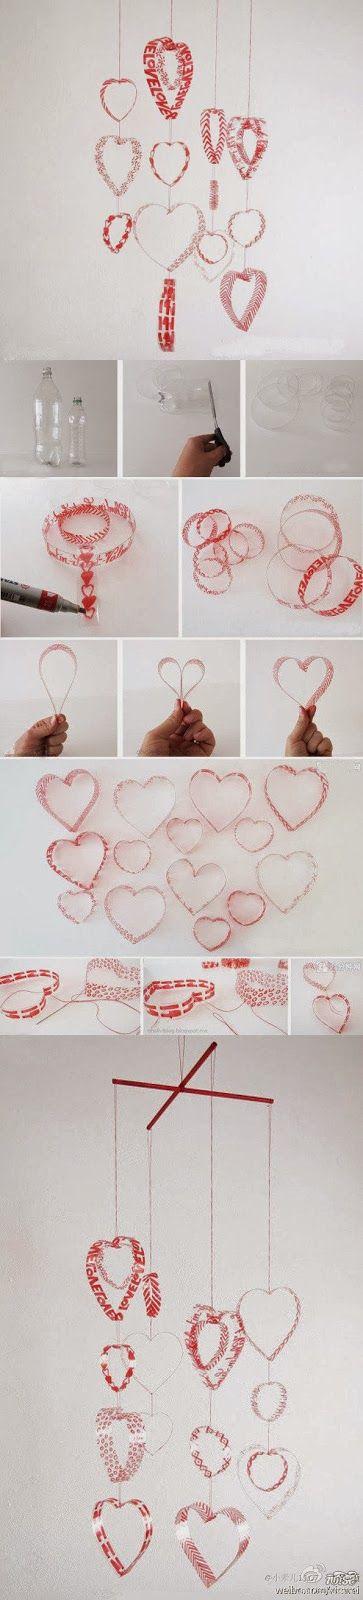 DIY : Plastic Bottle Heart Mobile | DIY & Crafts Tutorials